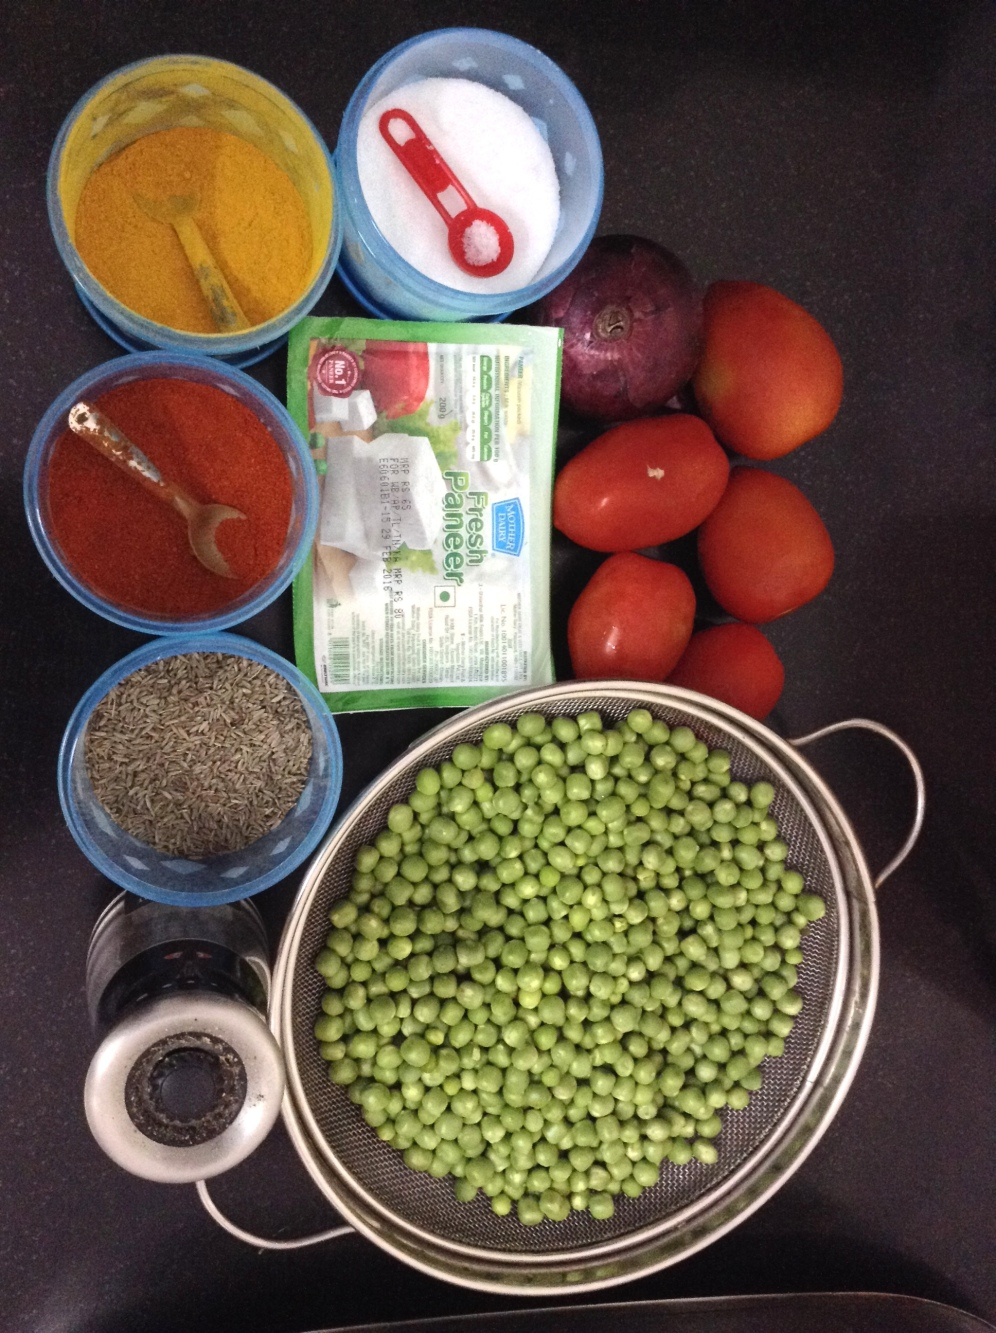 Peas (3 cups), Tomatoes (5), Onions (1 big/2 small), Paneer (200 g), Salt, Turmeric, Chilli powder, Cumin, Ghee, Pepper.